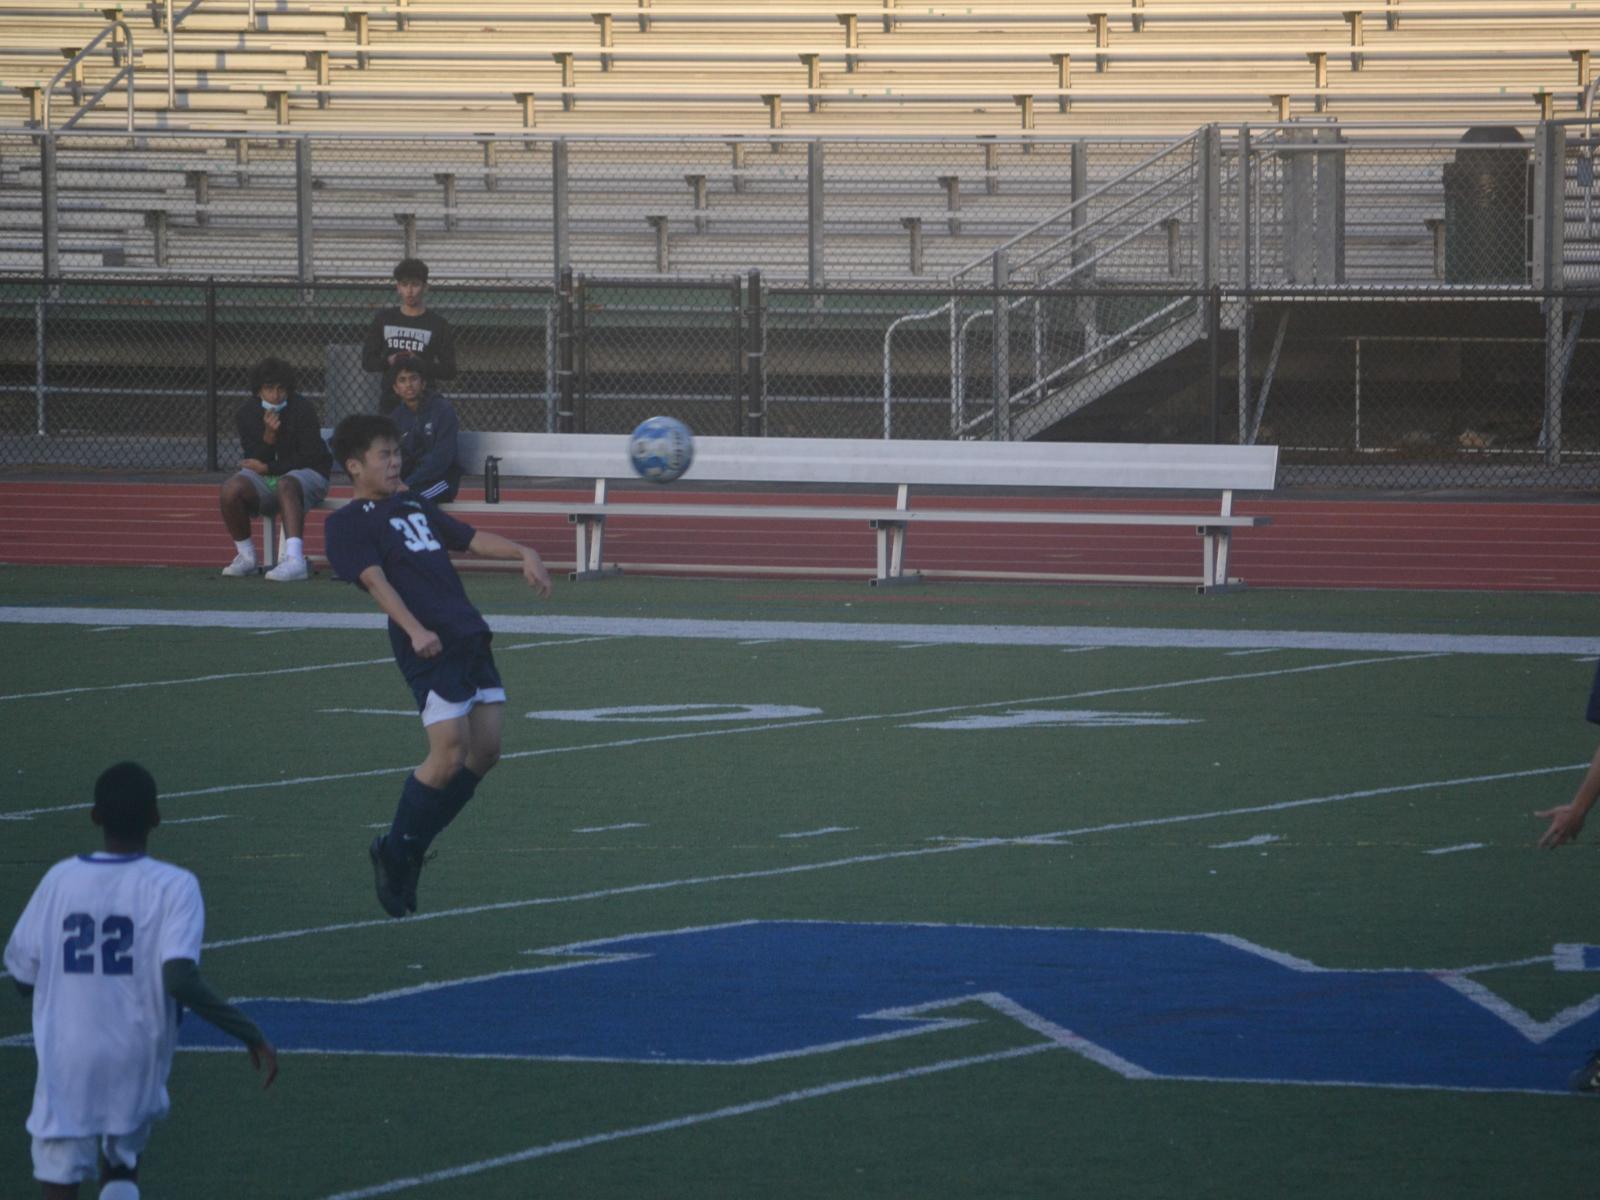 JV Boys win 5:3 against Centennial